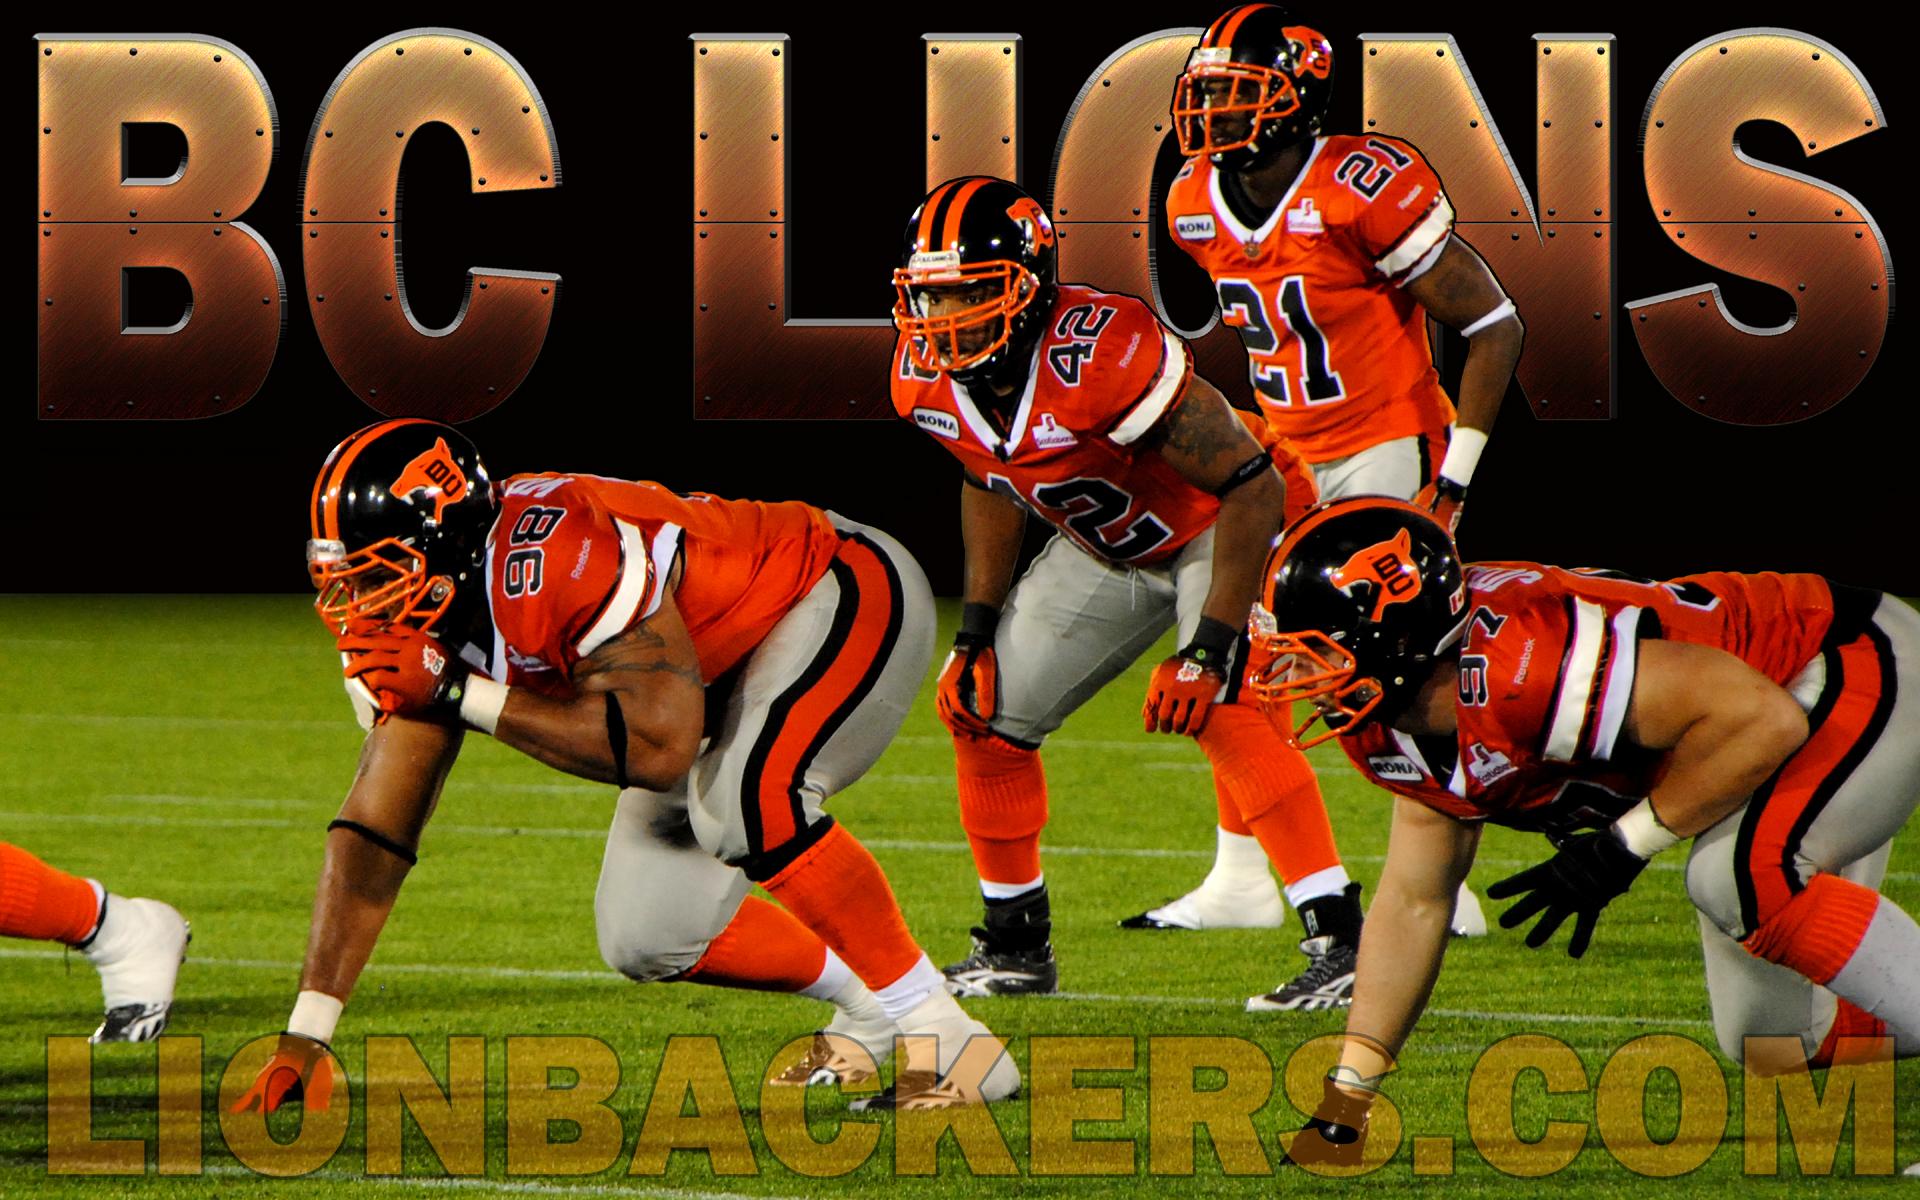 Lionbackerscom   The BC Lions Fan Den   Desktop Wallpapers 1920x1200